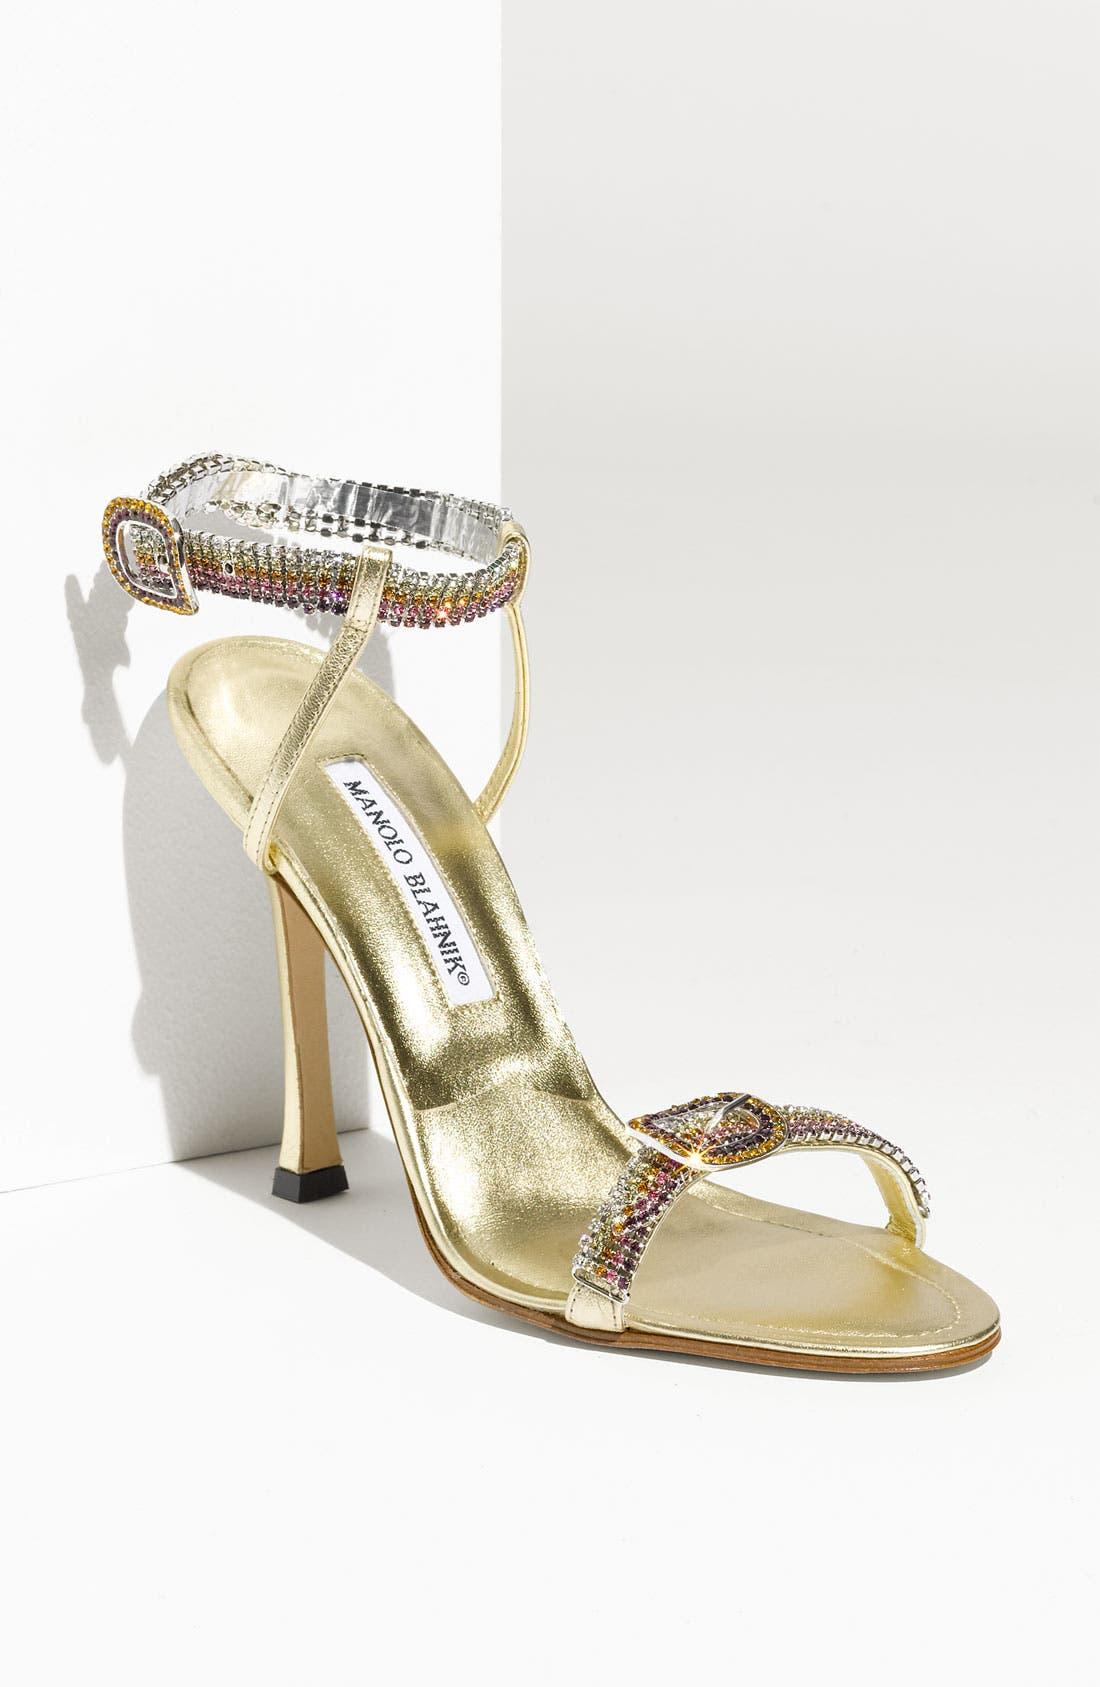 Main Image - Manolo Blahnik 'Janetba' Rhinestone Strap Sandal